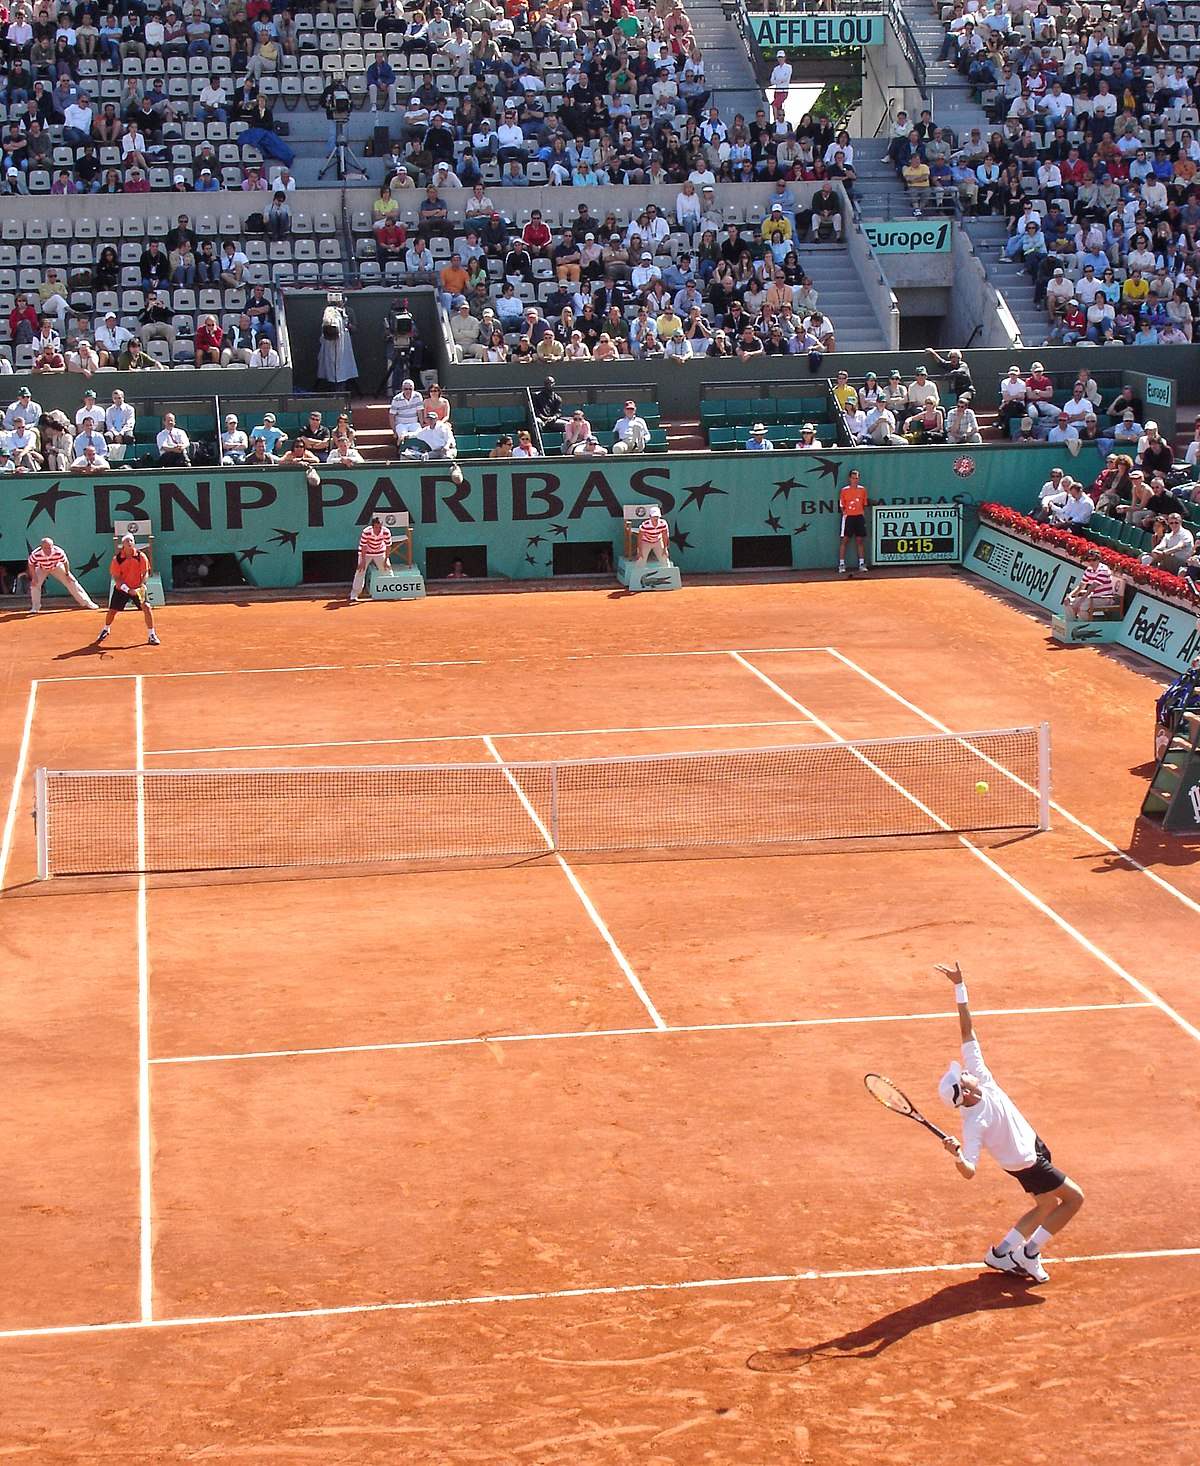 Stade Roland Garros Wikipedia - Us open tennis location map